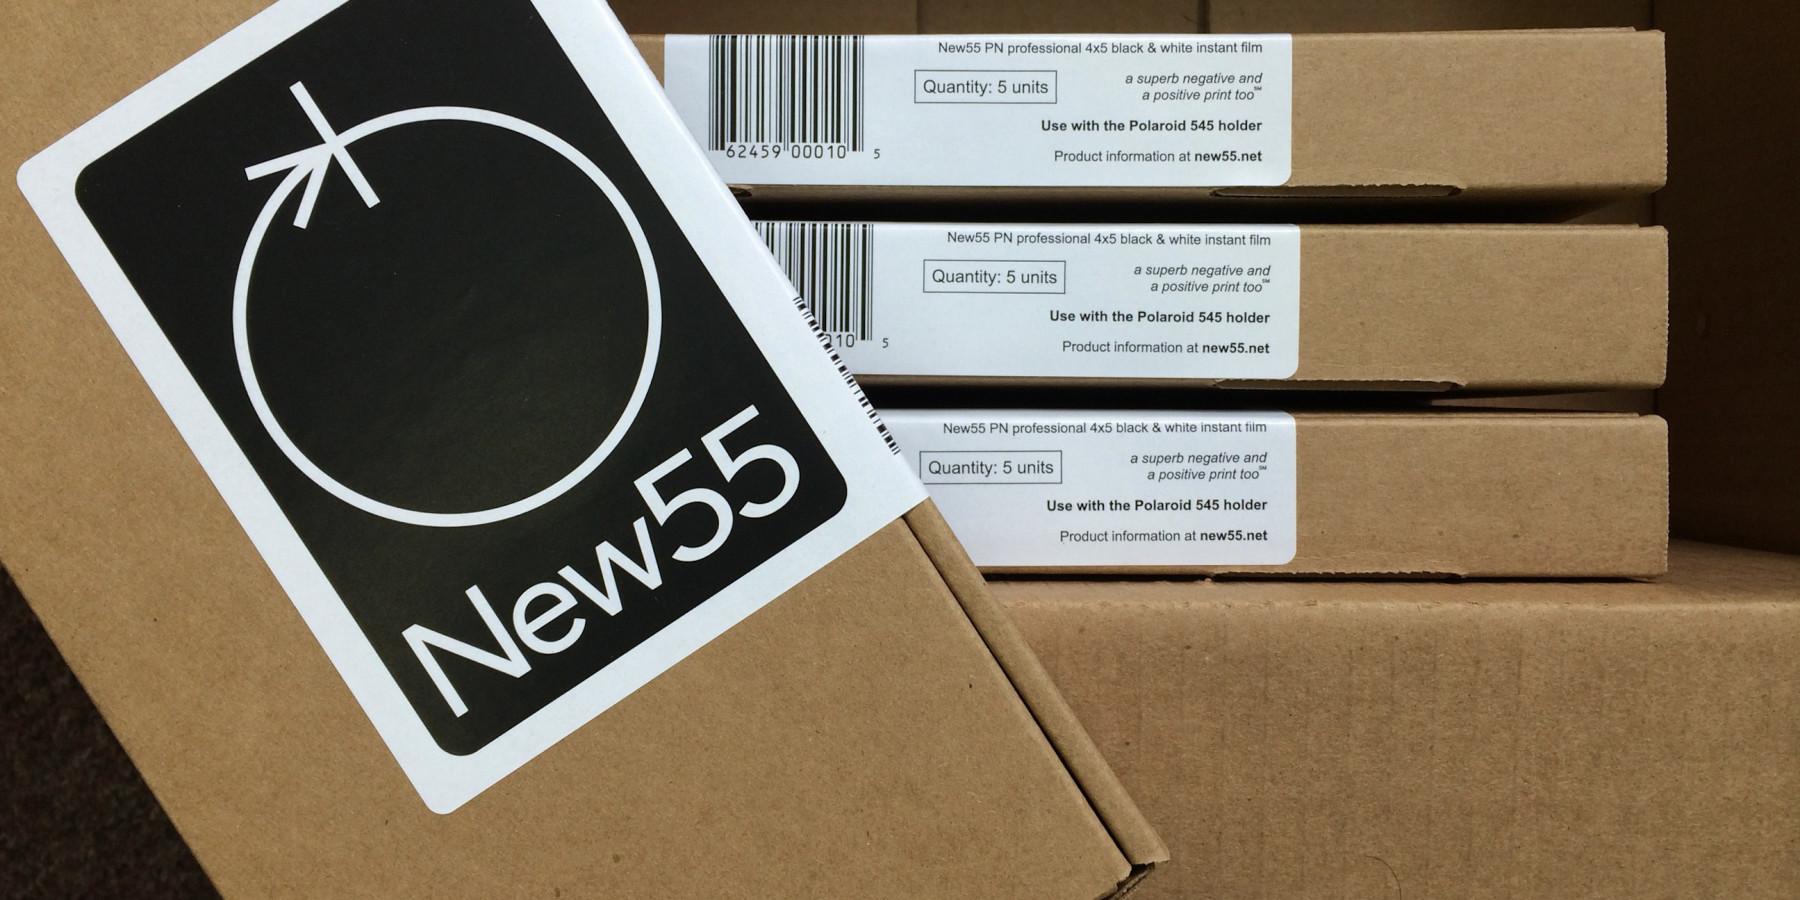 new55 film